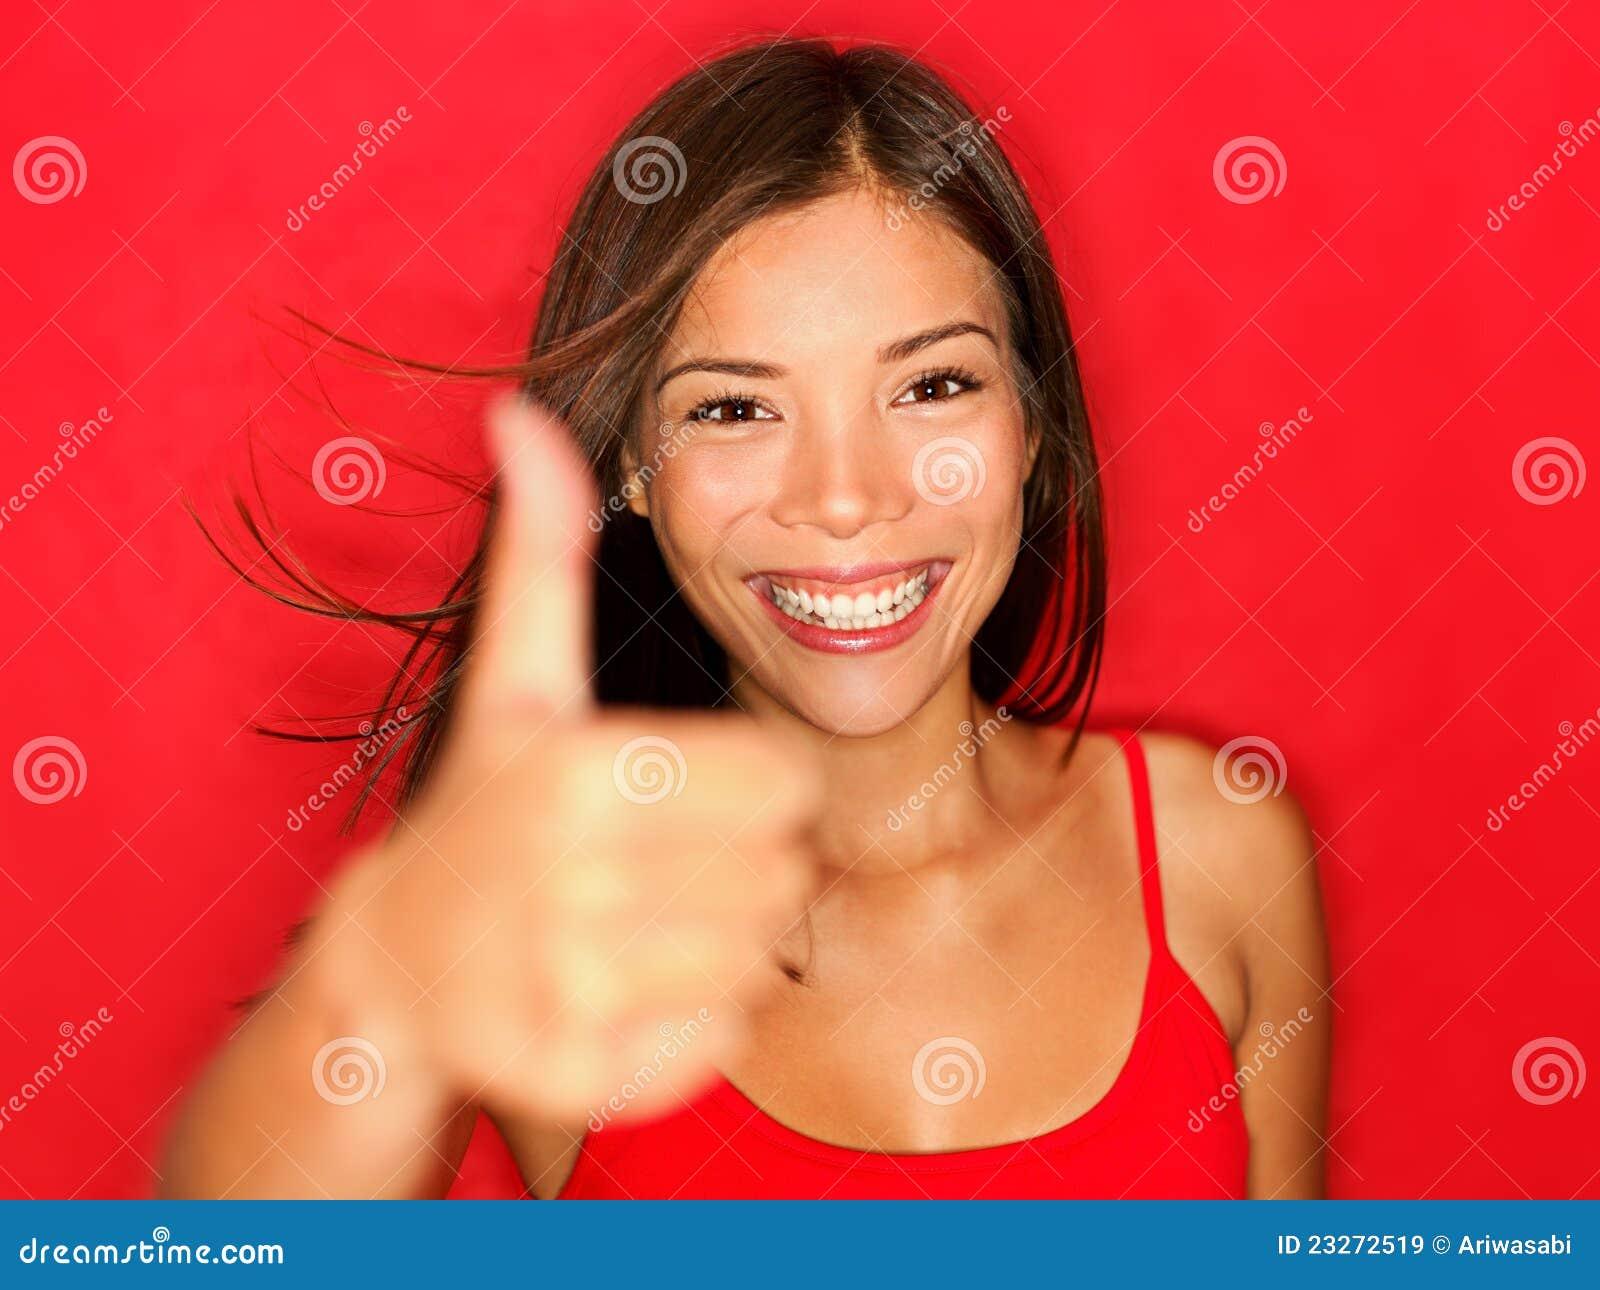 girl thumbs Natural